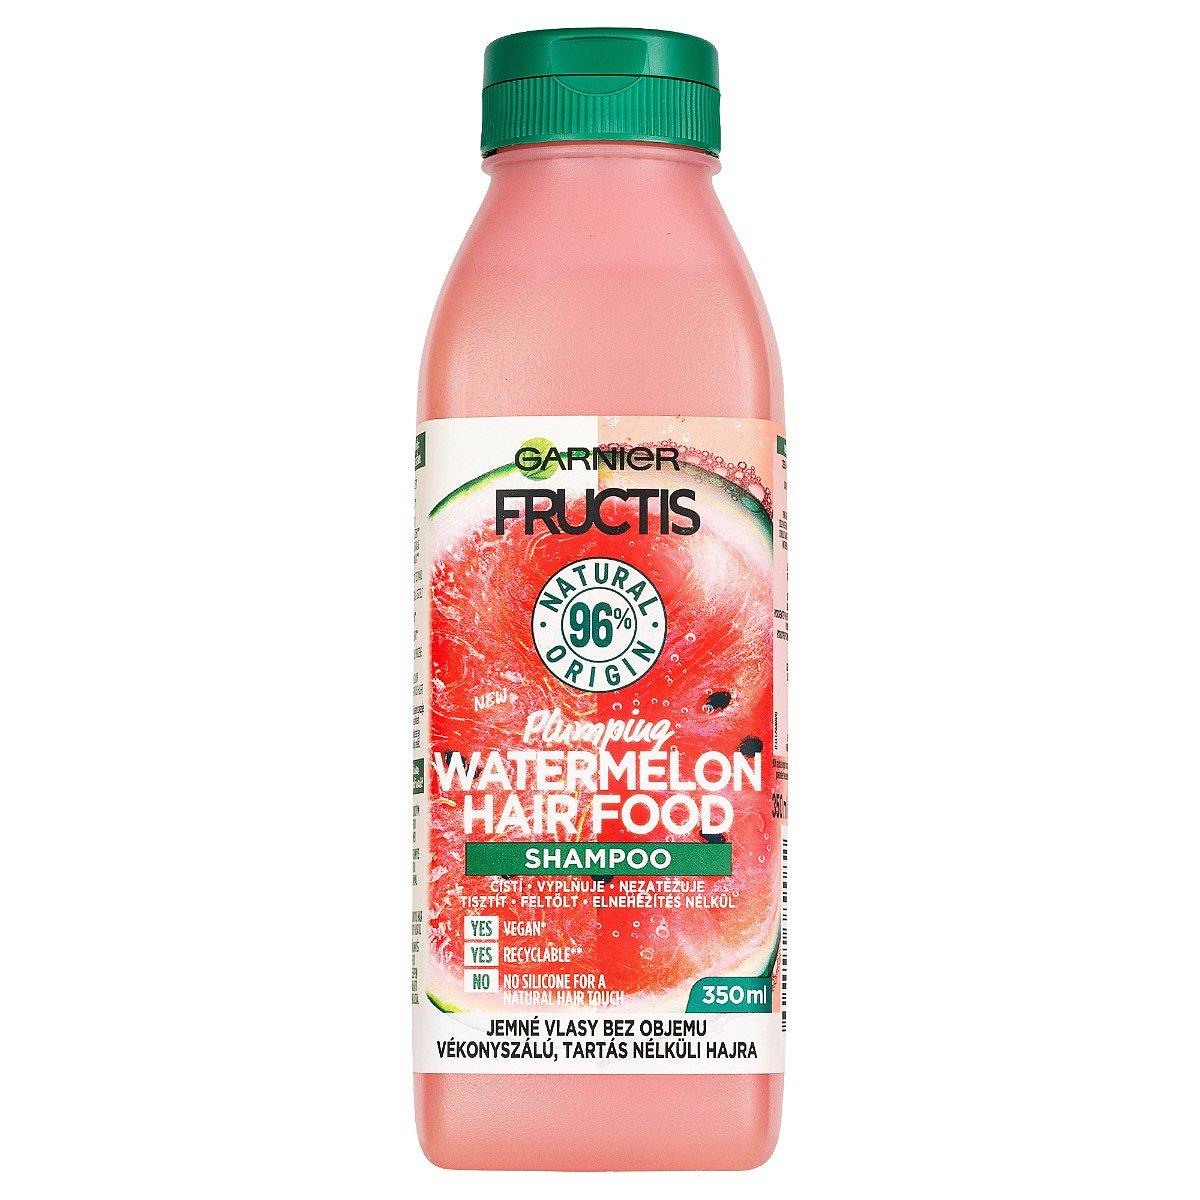 Garnier Fructis Hair Food Watermelon šampon pro jemné vlasy bez objemu 350 ml